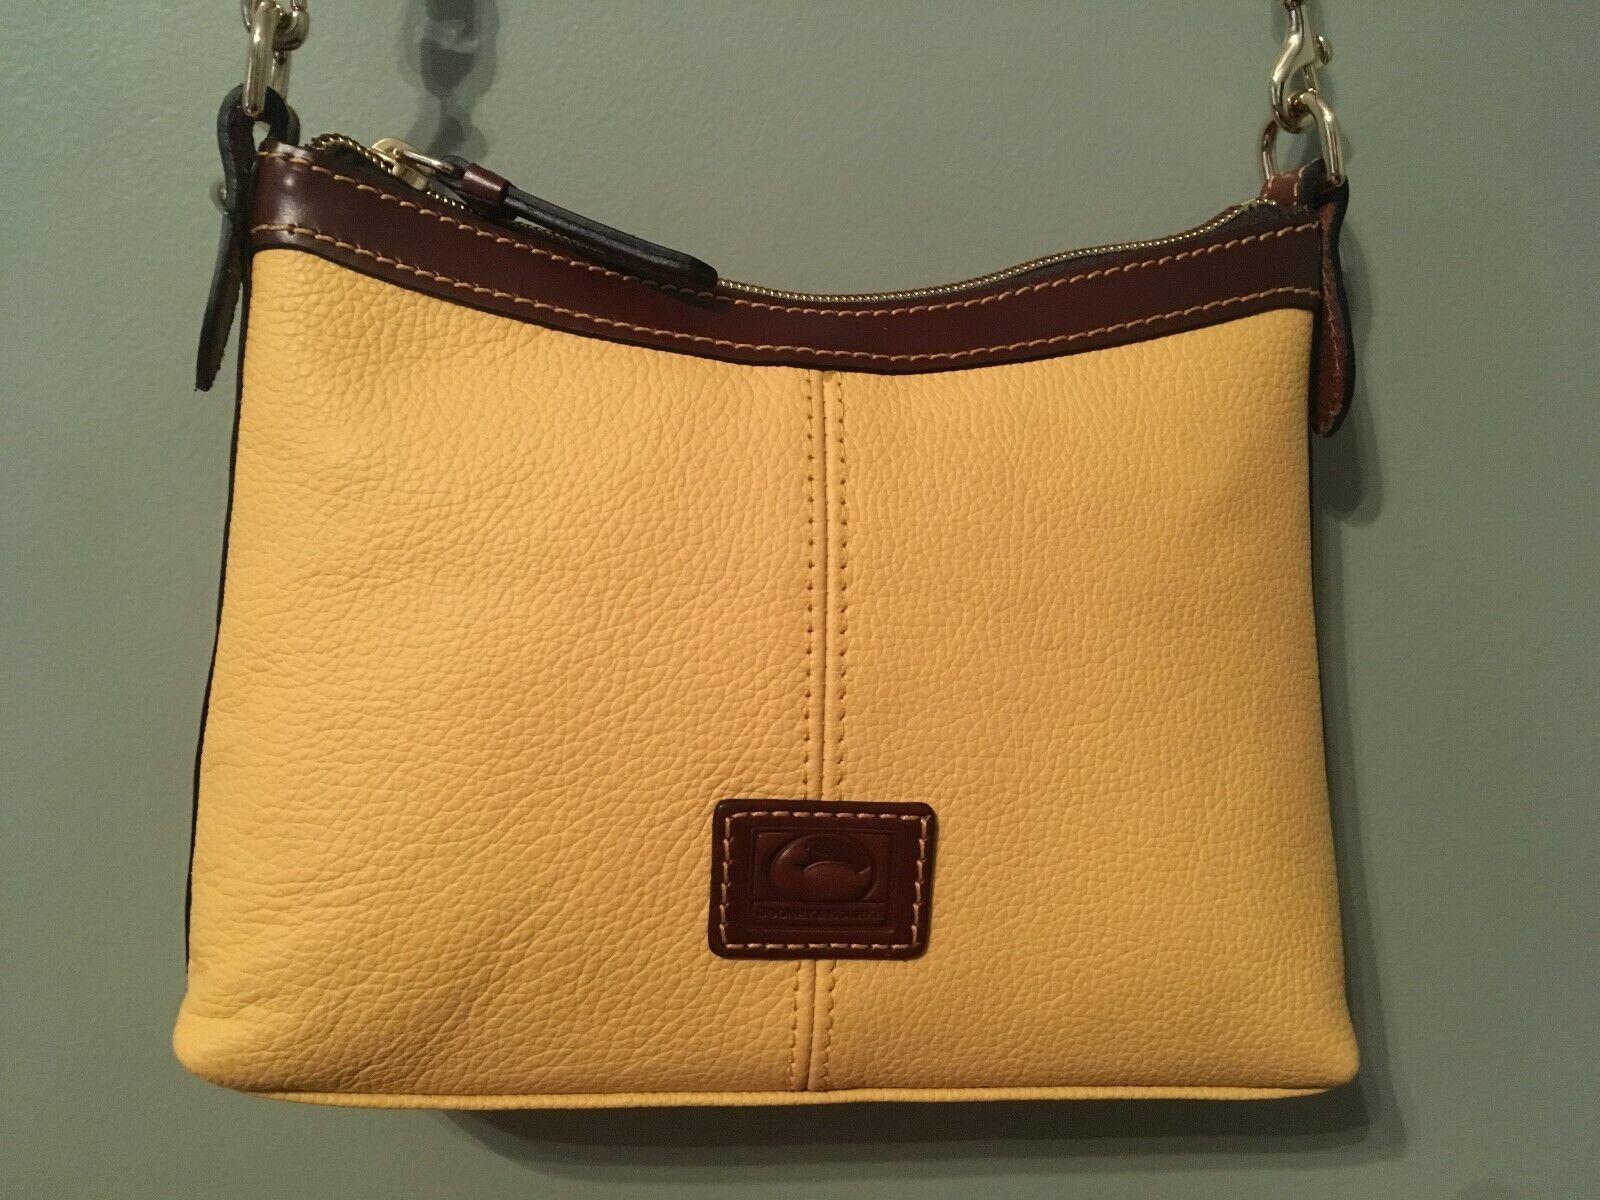 dooney and bourke crossbody handbag nwt lemon